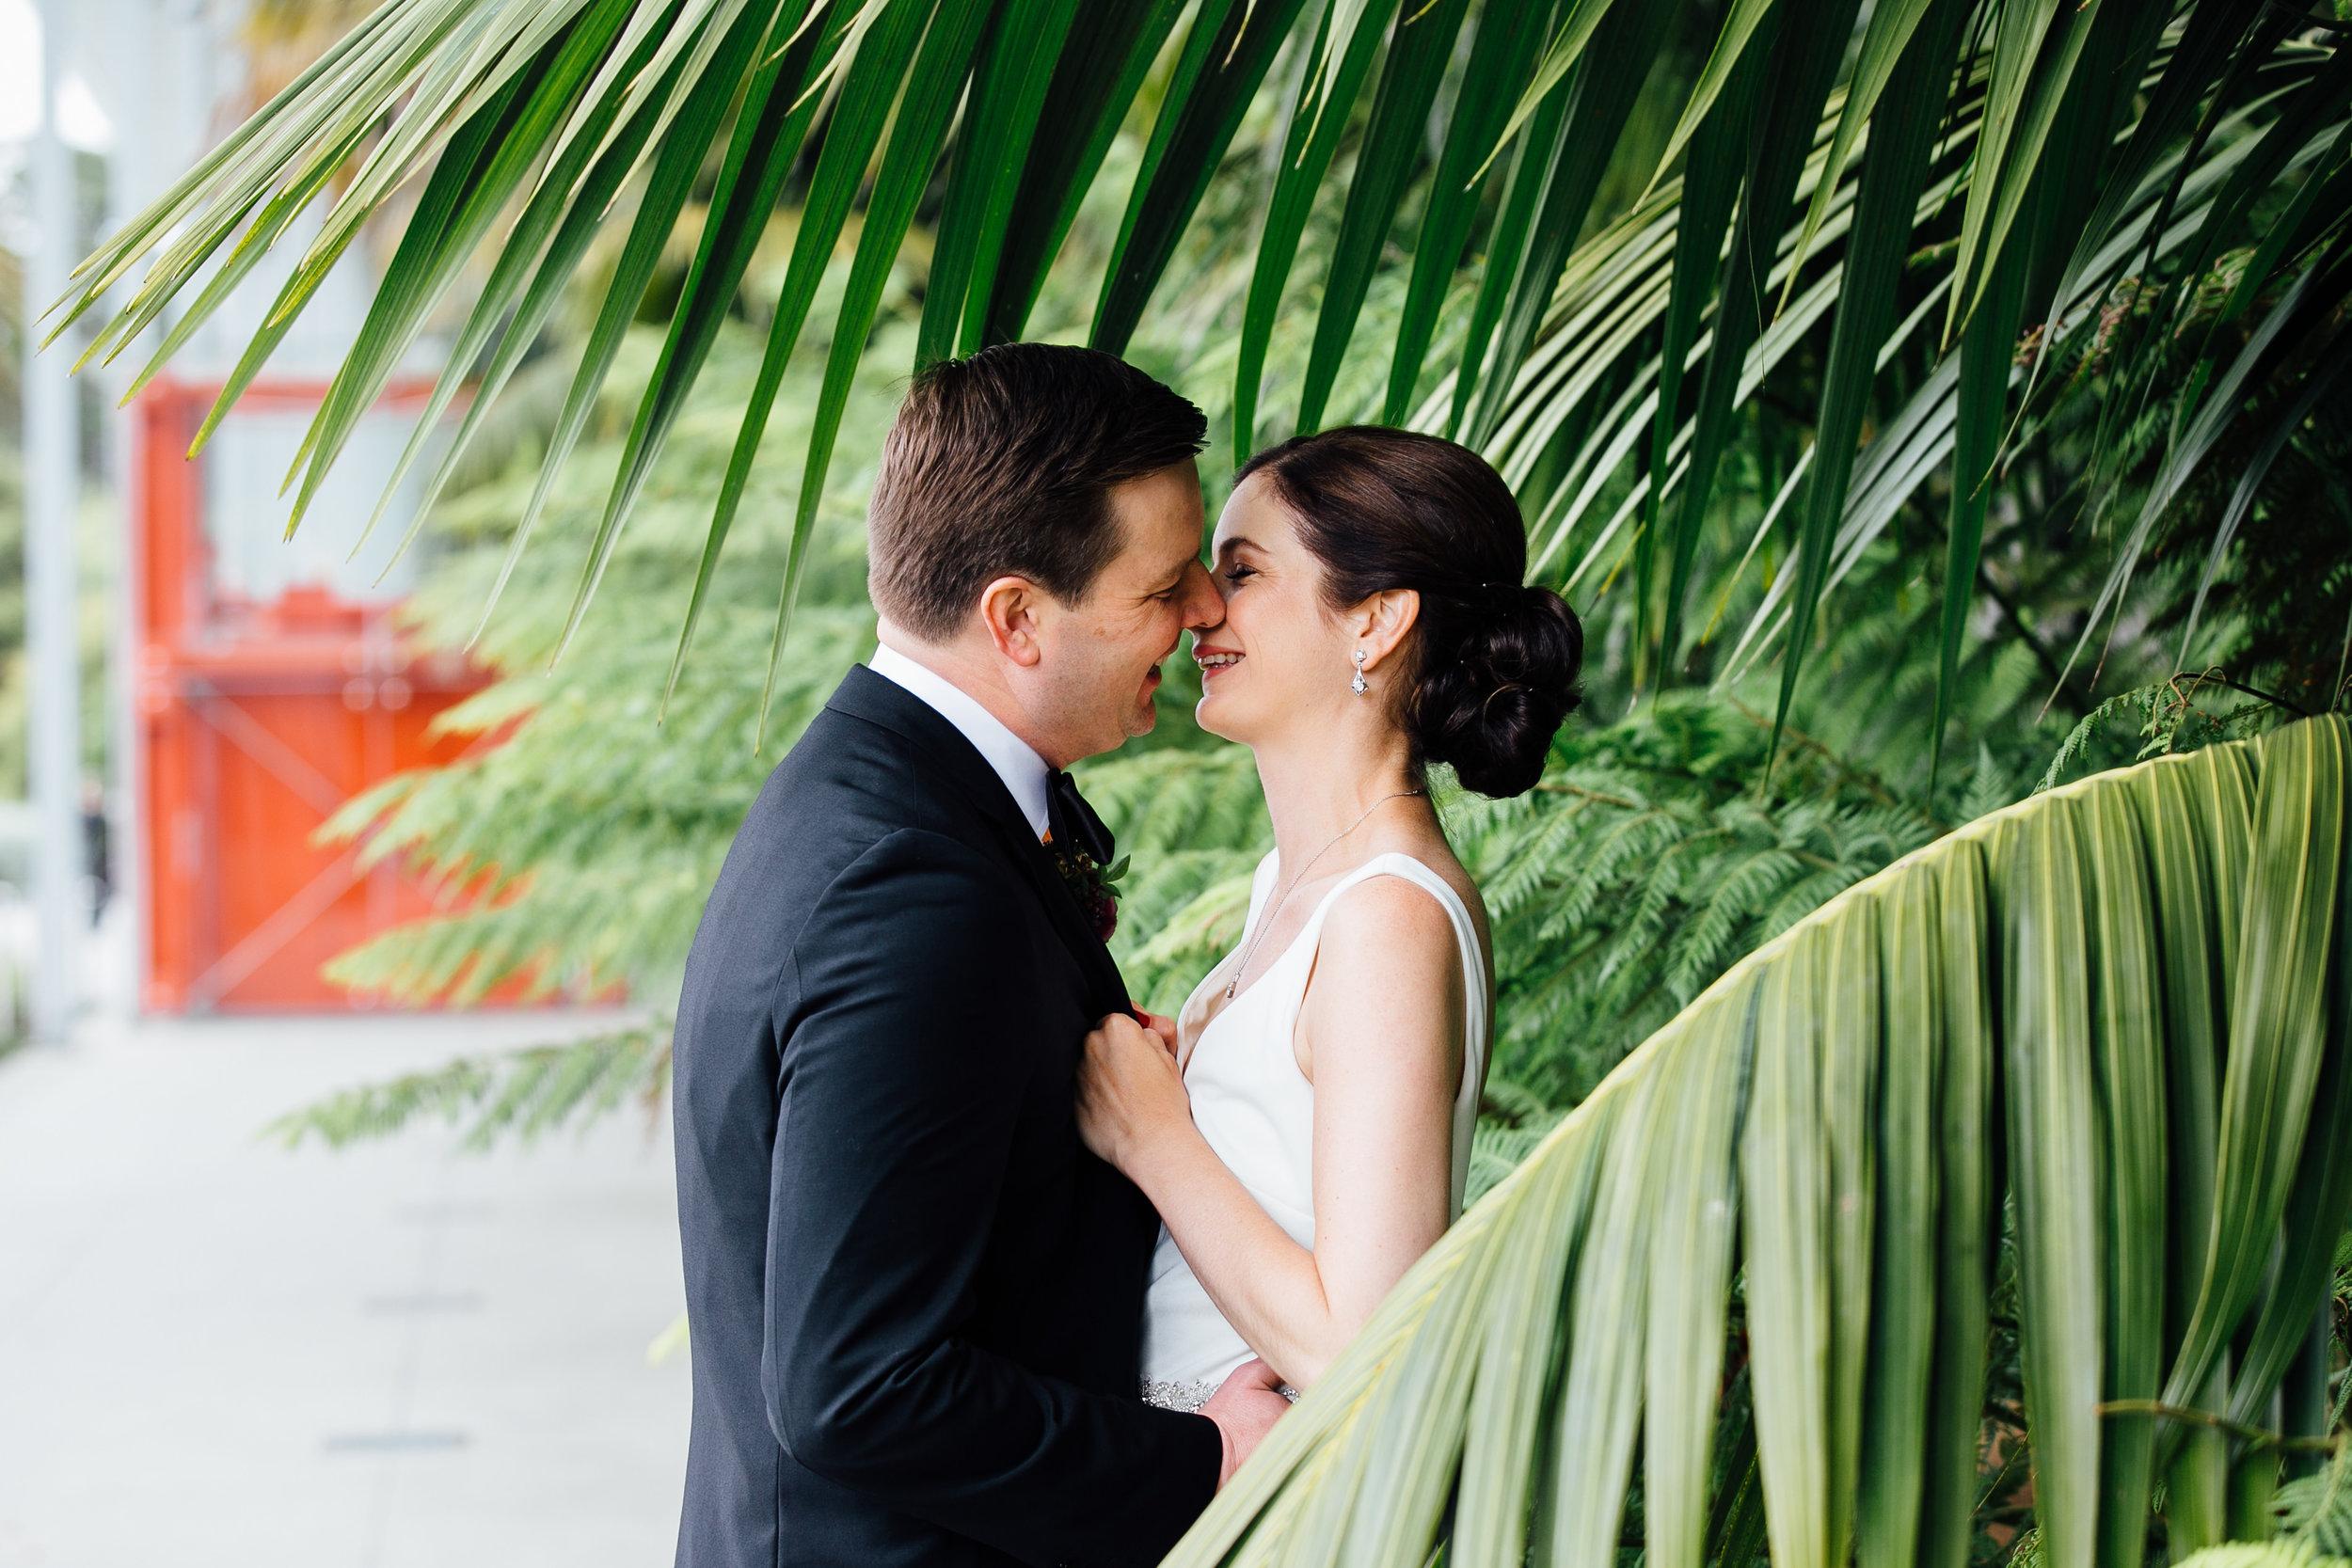 Wedding_KathleenMichael_BG_Portraits-275.jpg